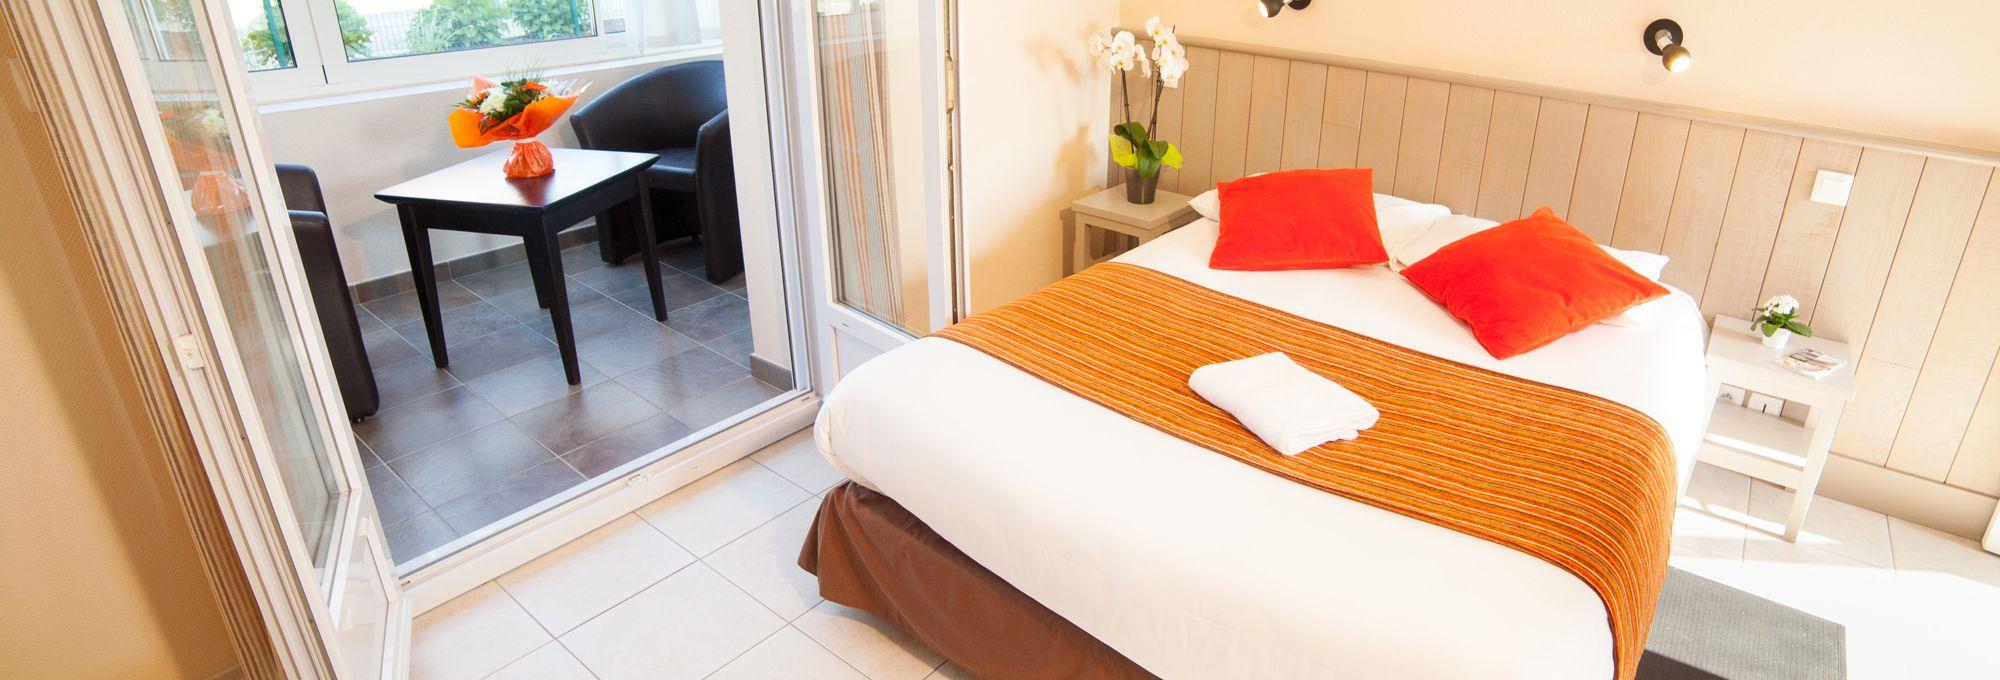 Brit Hotel Aux Hortensias - Lannion